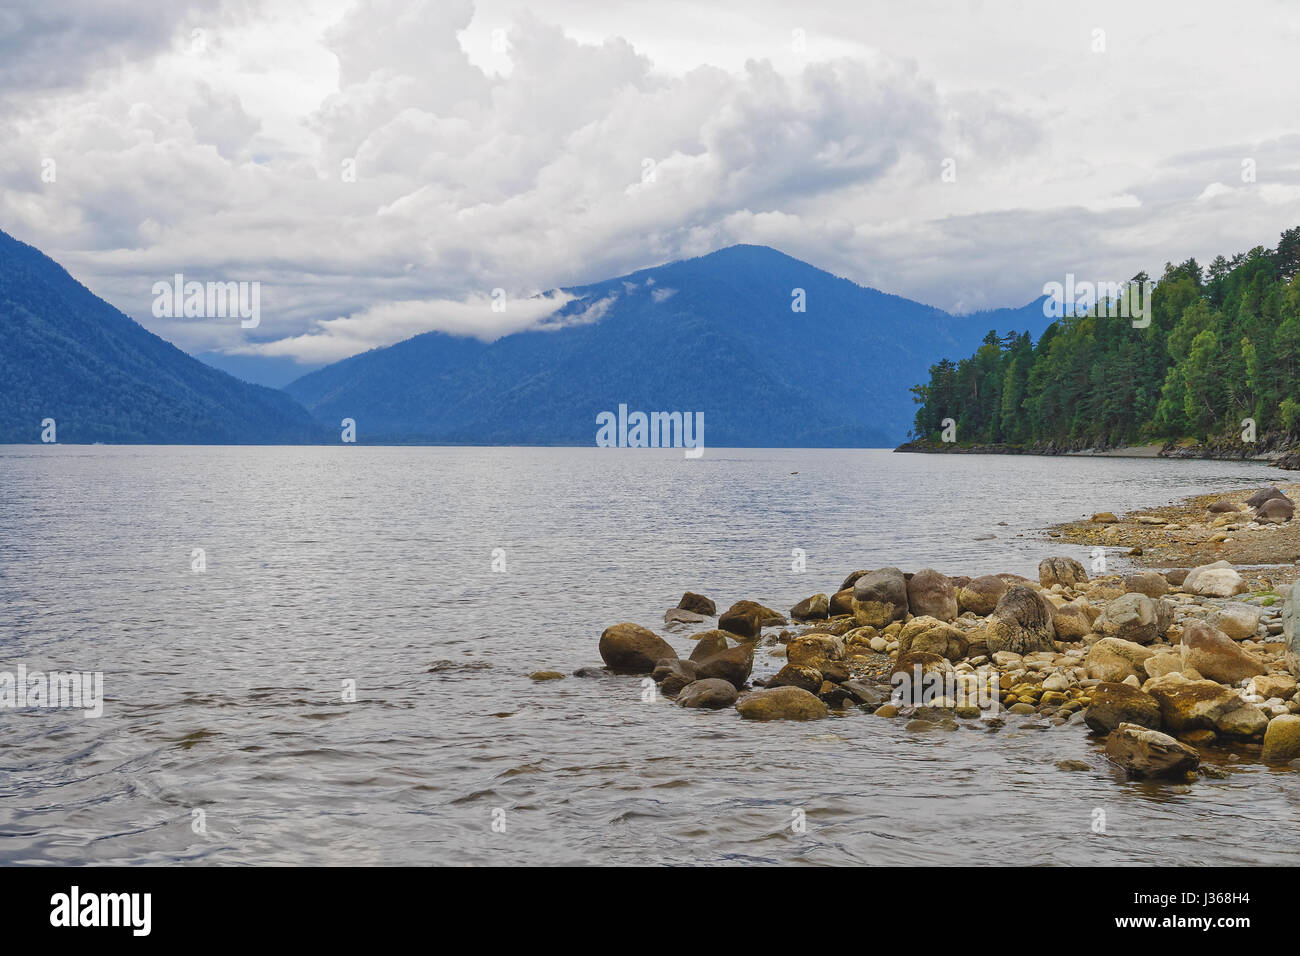 Mountain Altai, Teletskoe lake, view from the eastern shore Stock Photo